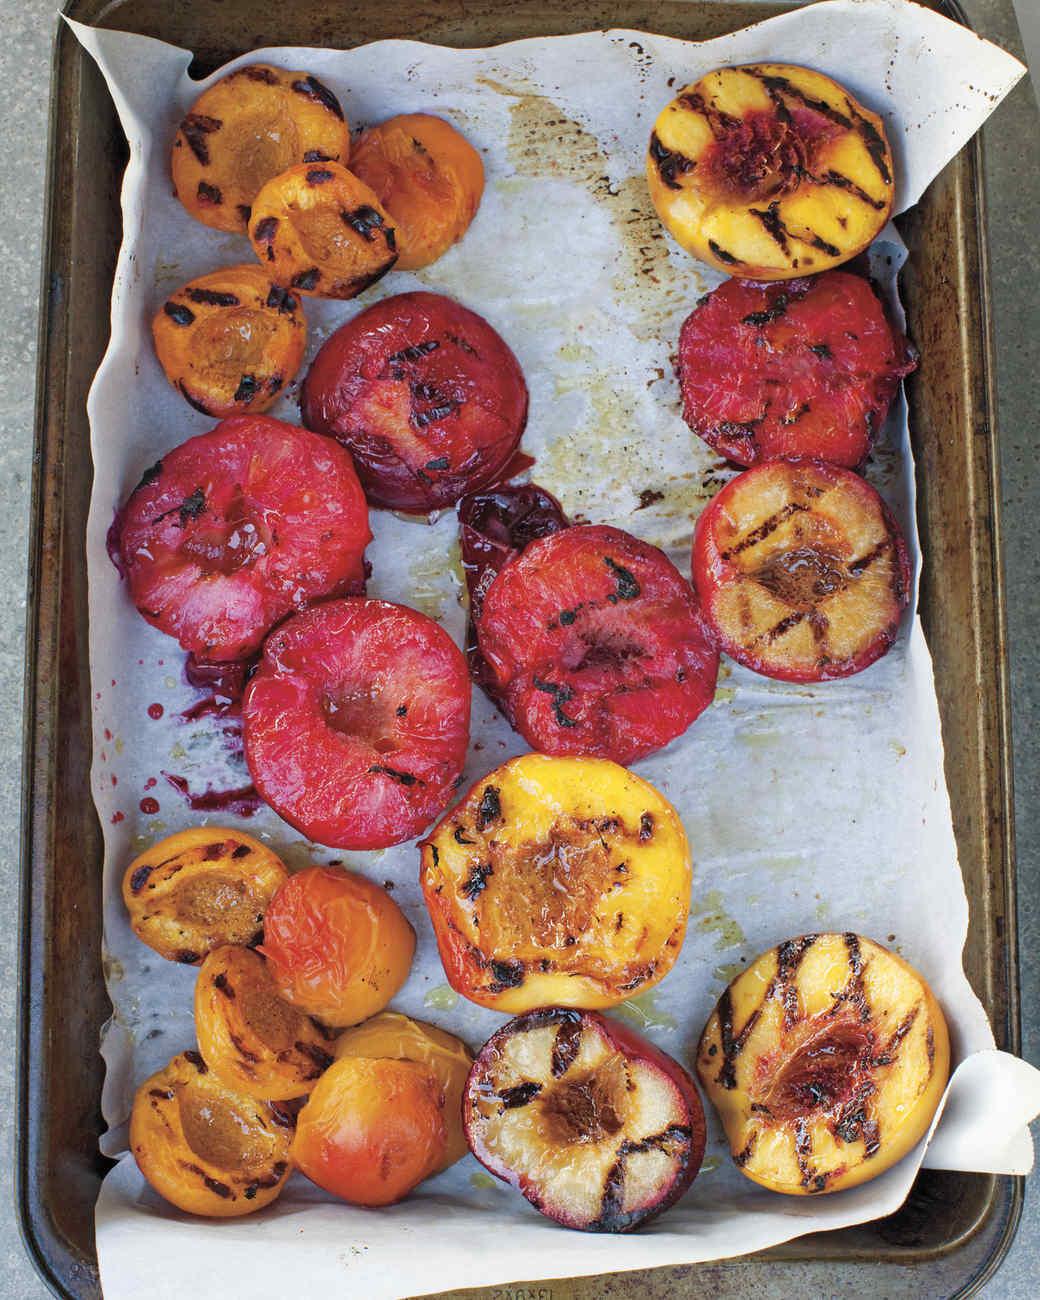 bbq-grilled-fruit-m108613.jpg